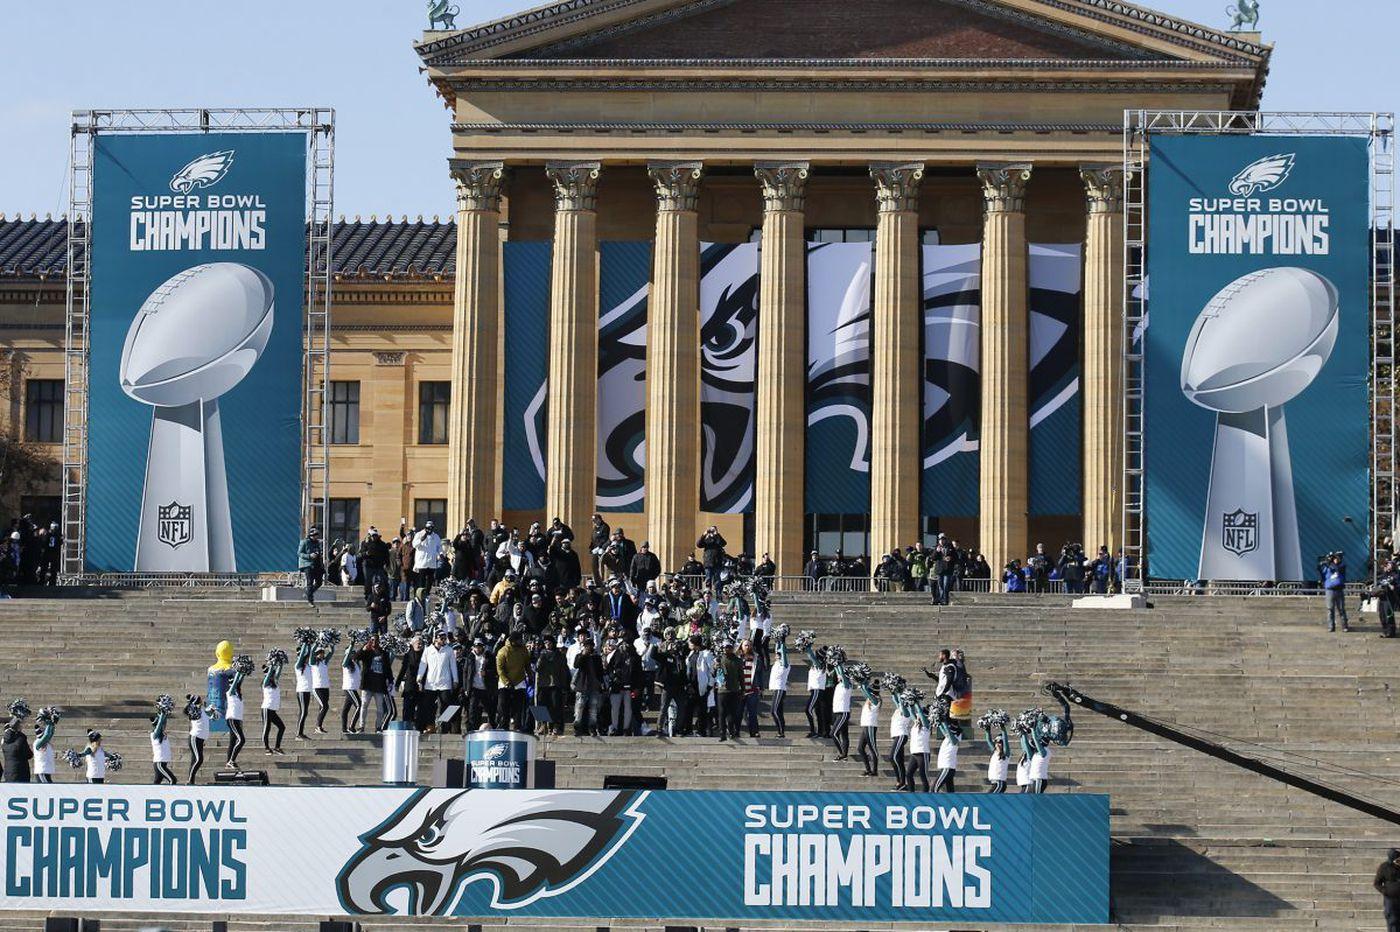 Rendell: Basking in Super Bowl glory